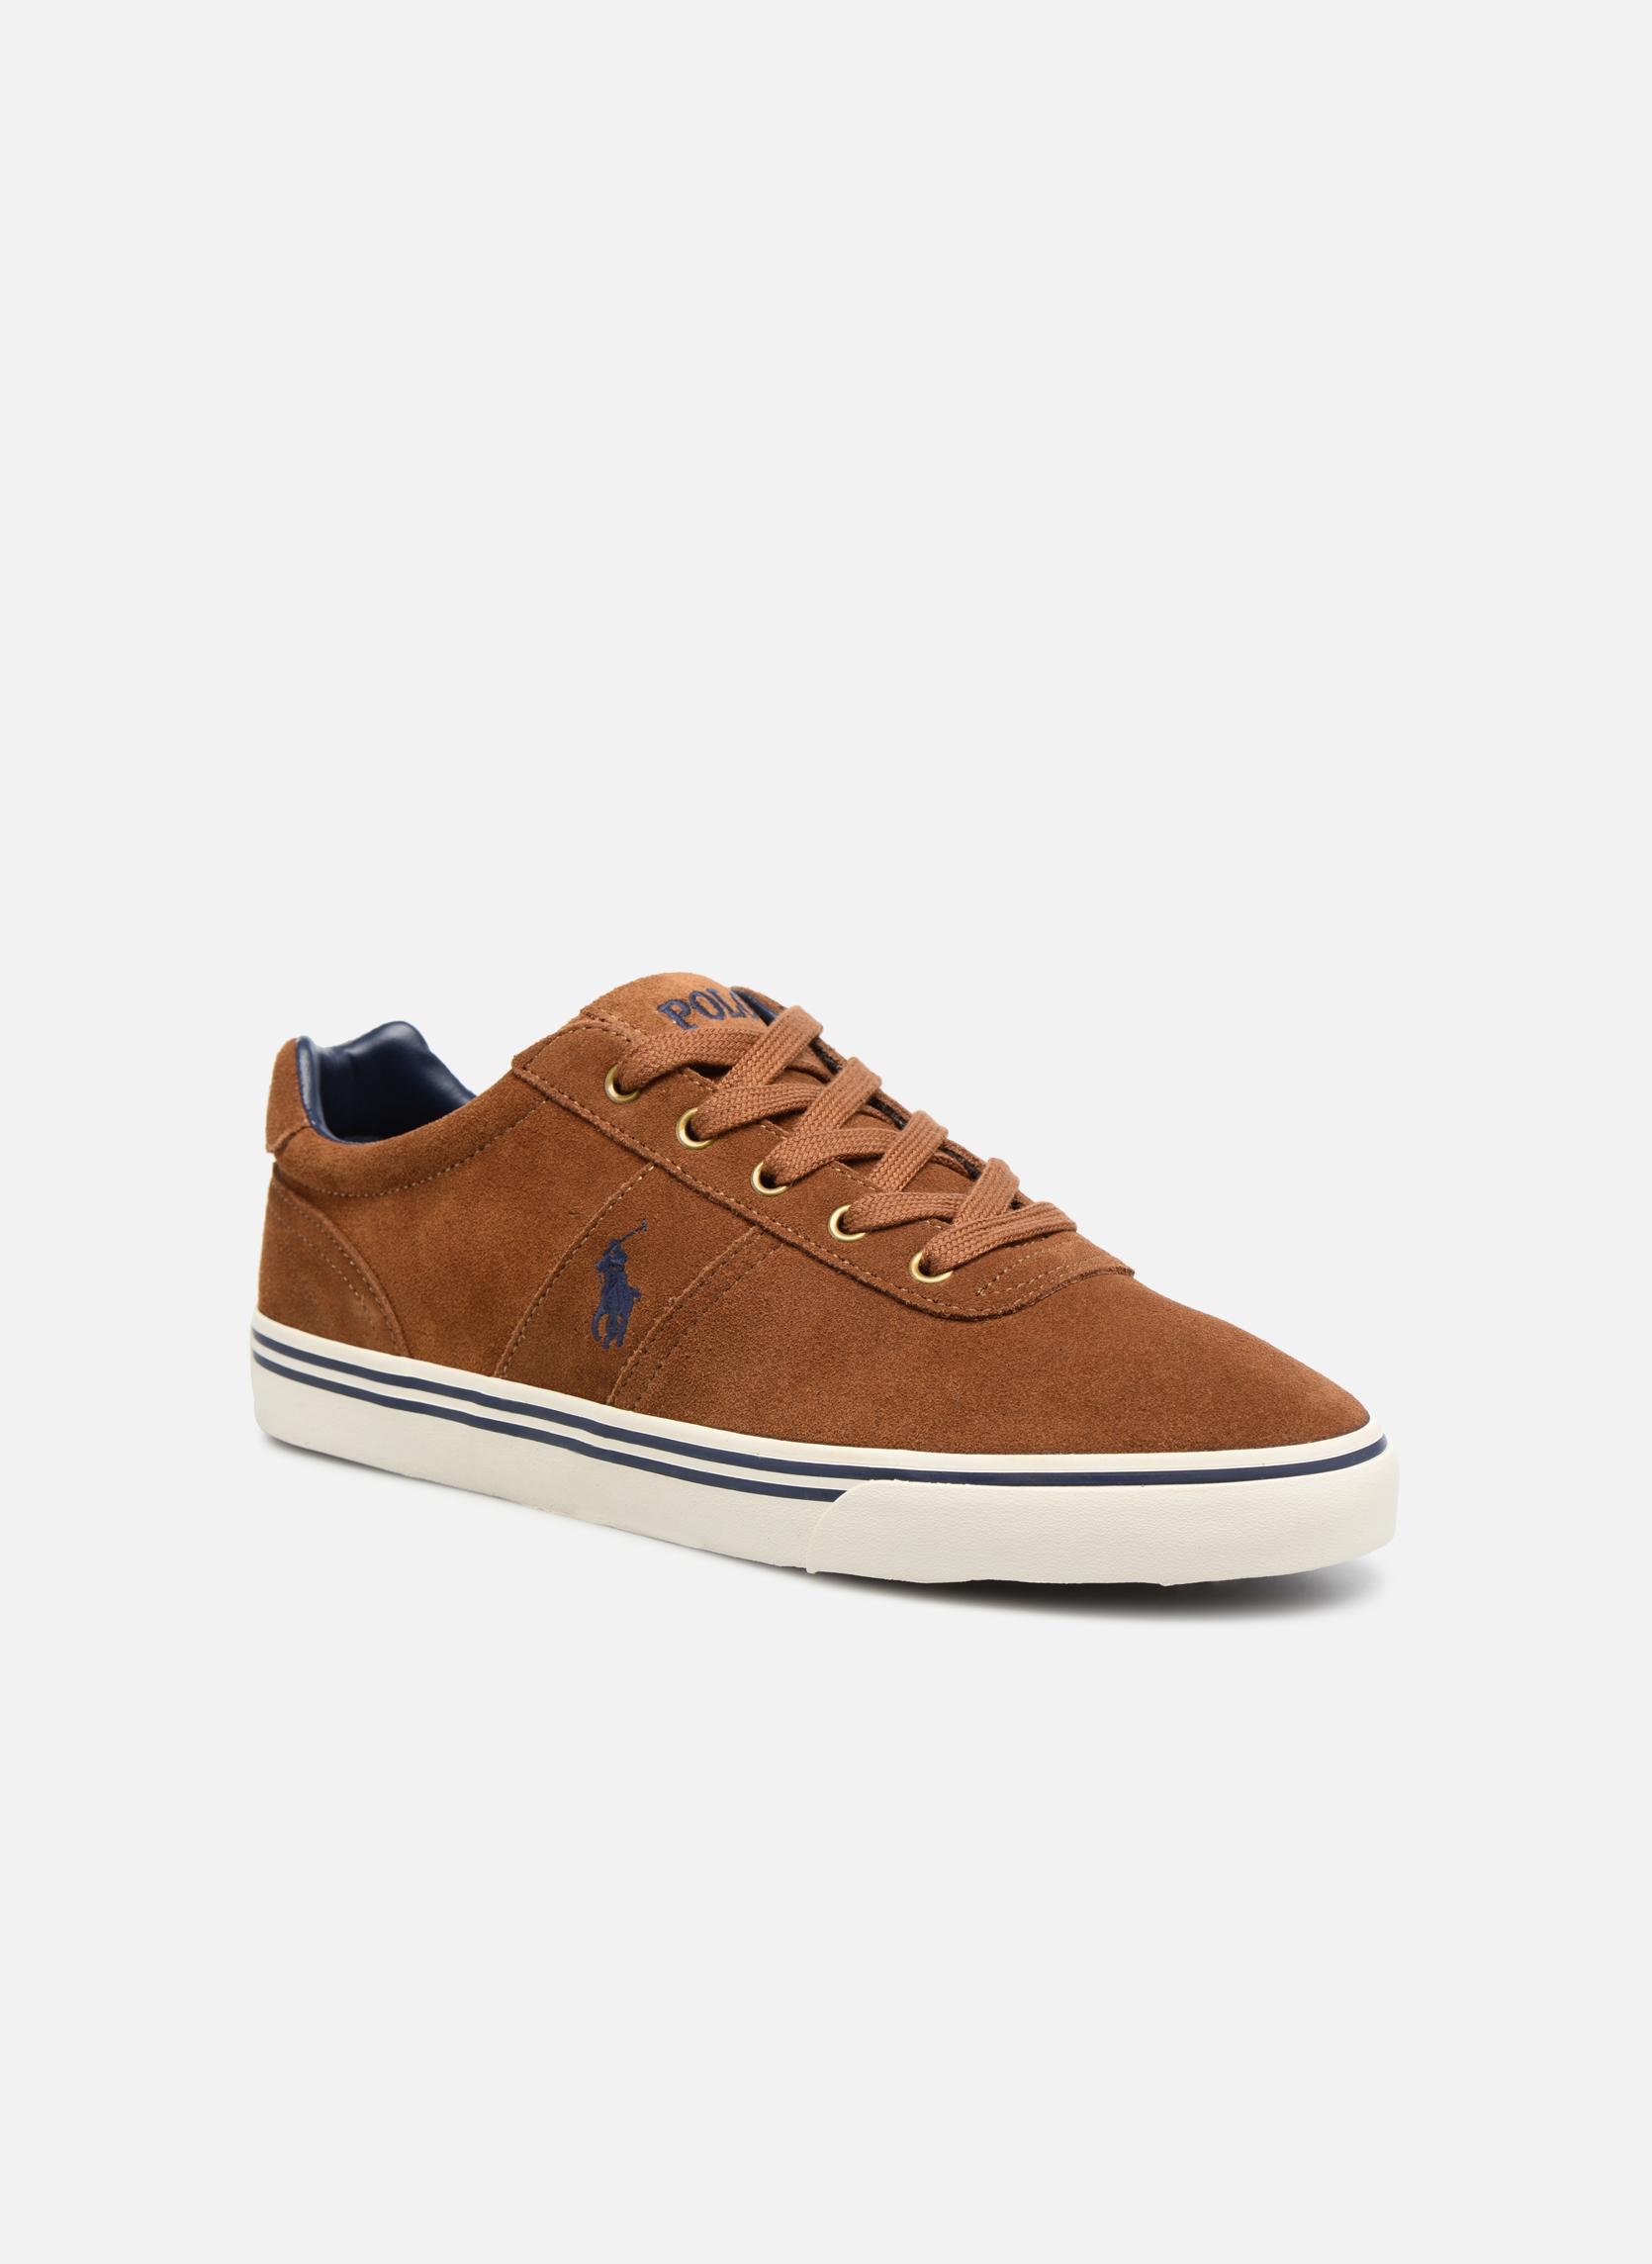 Trainers Men Hanford-Sneakers-Vulc